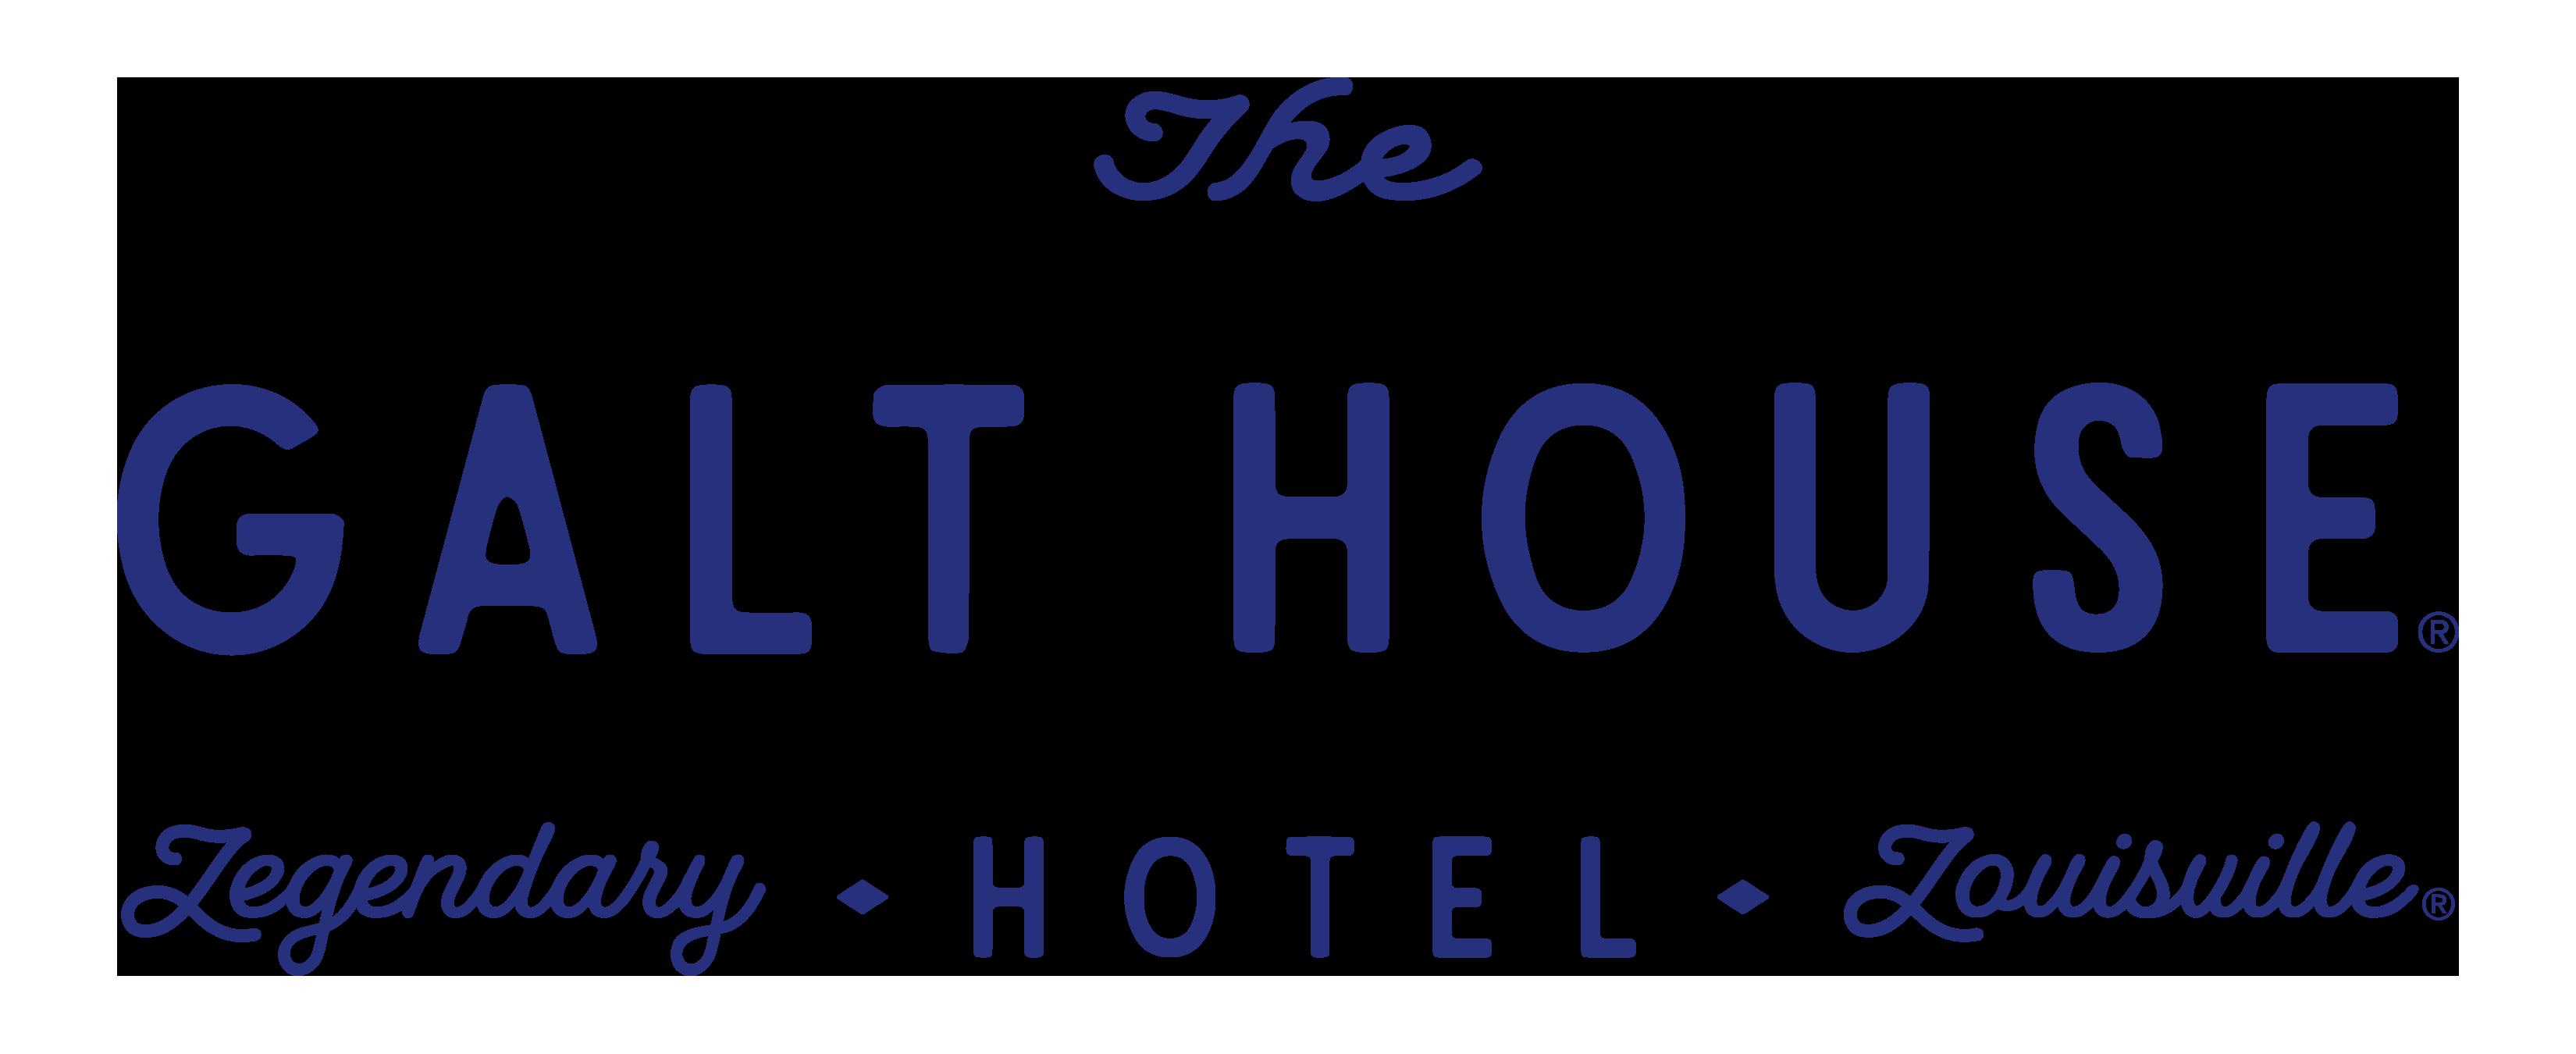 Galthouse Logo